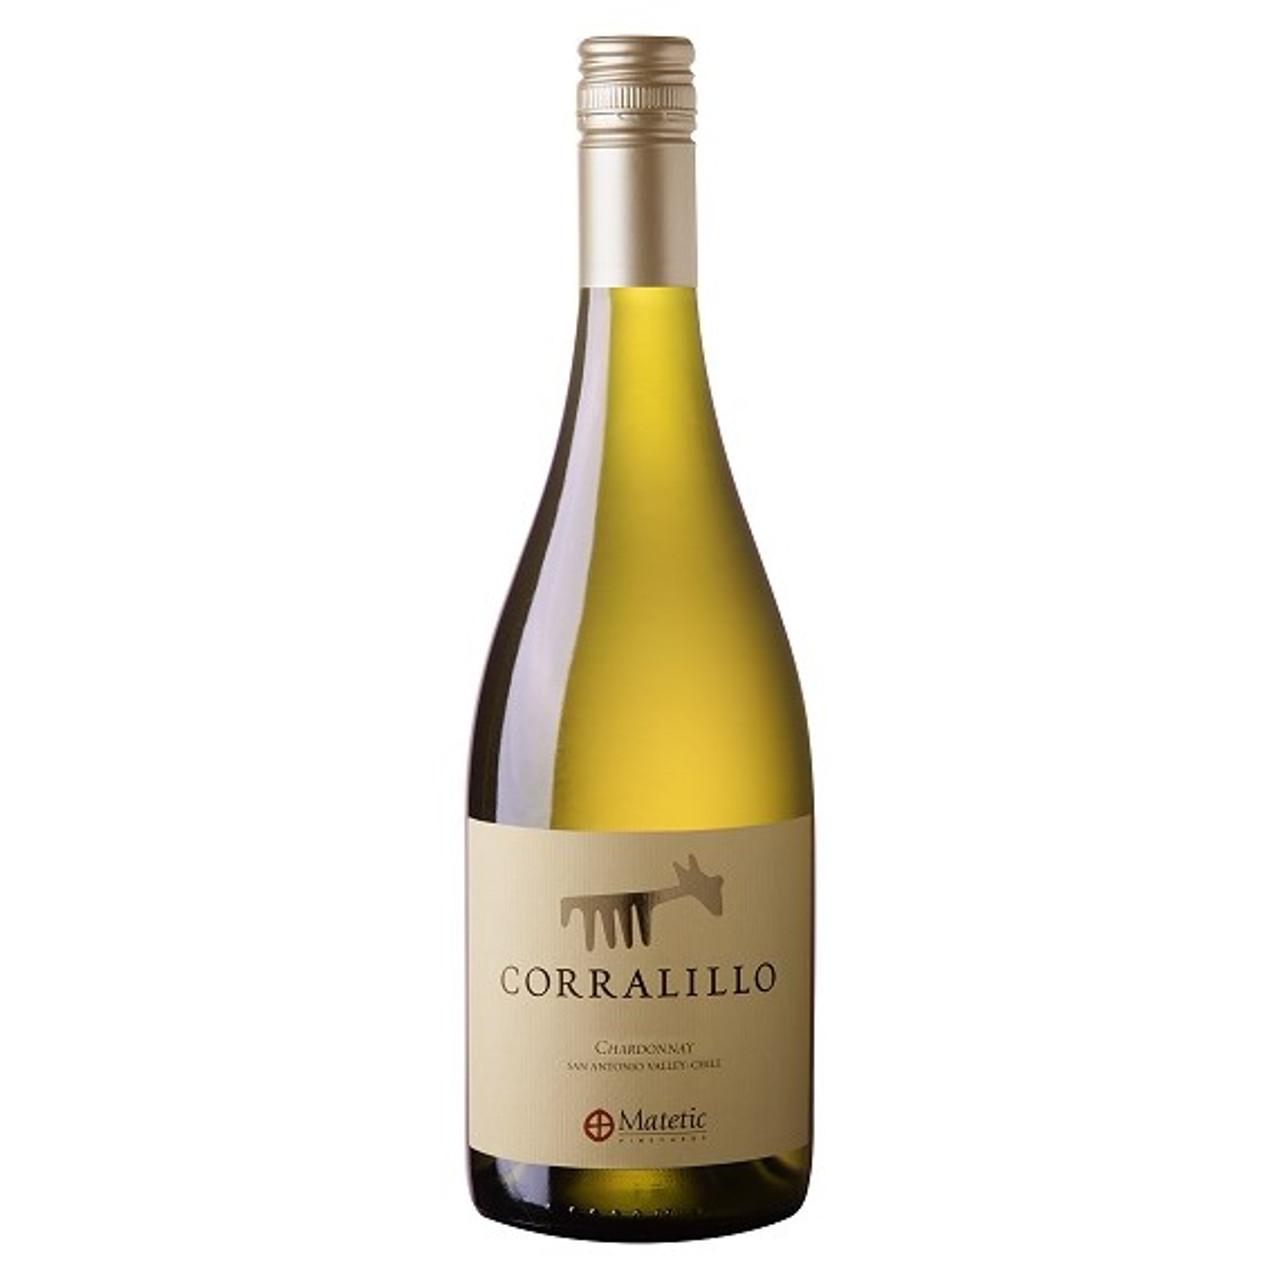 Matetic Vineyards, Corralillo Chardonnay 2016